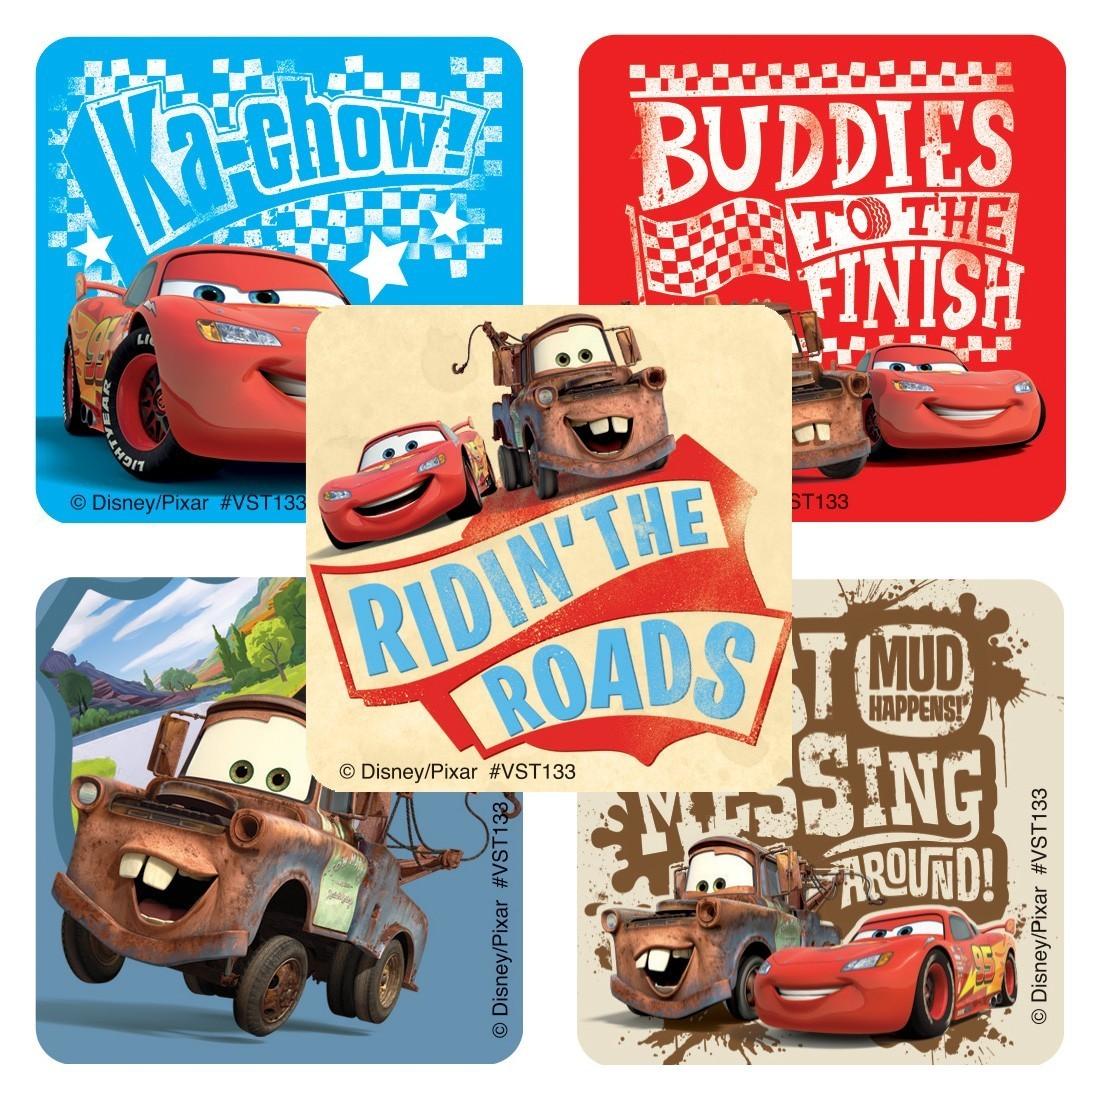 Disney*Pixar Cars ValueStickers [image]